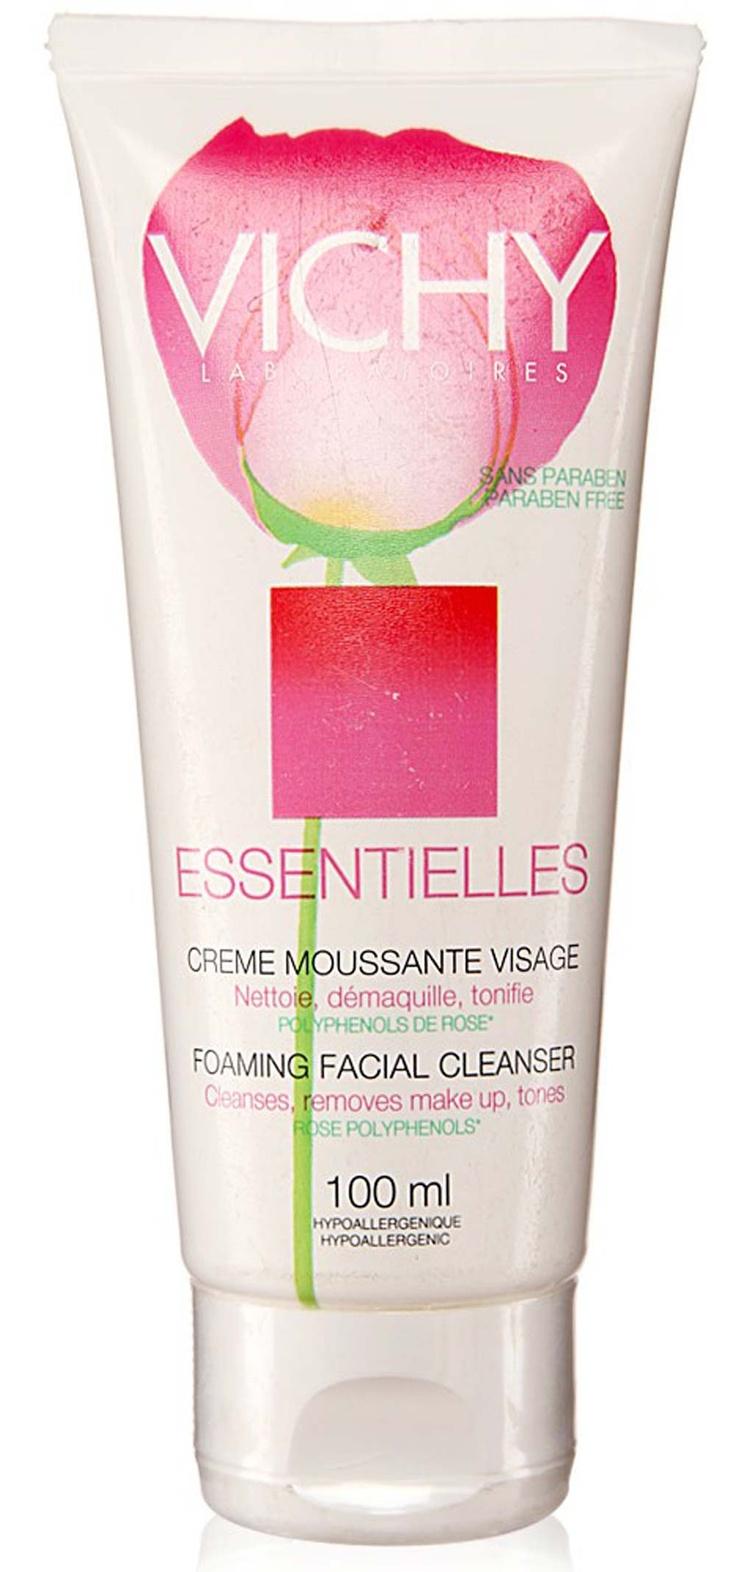 Vichy Men Women Skin Care Esentieles Foaming Facial Cleanser 100ml